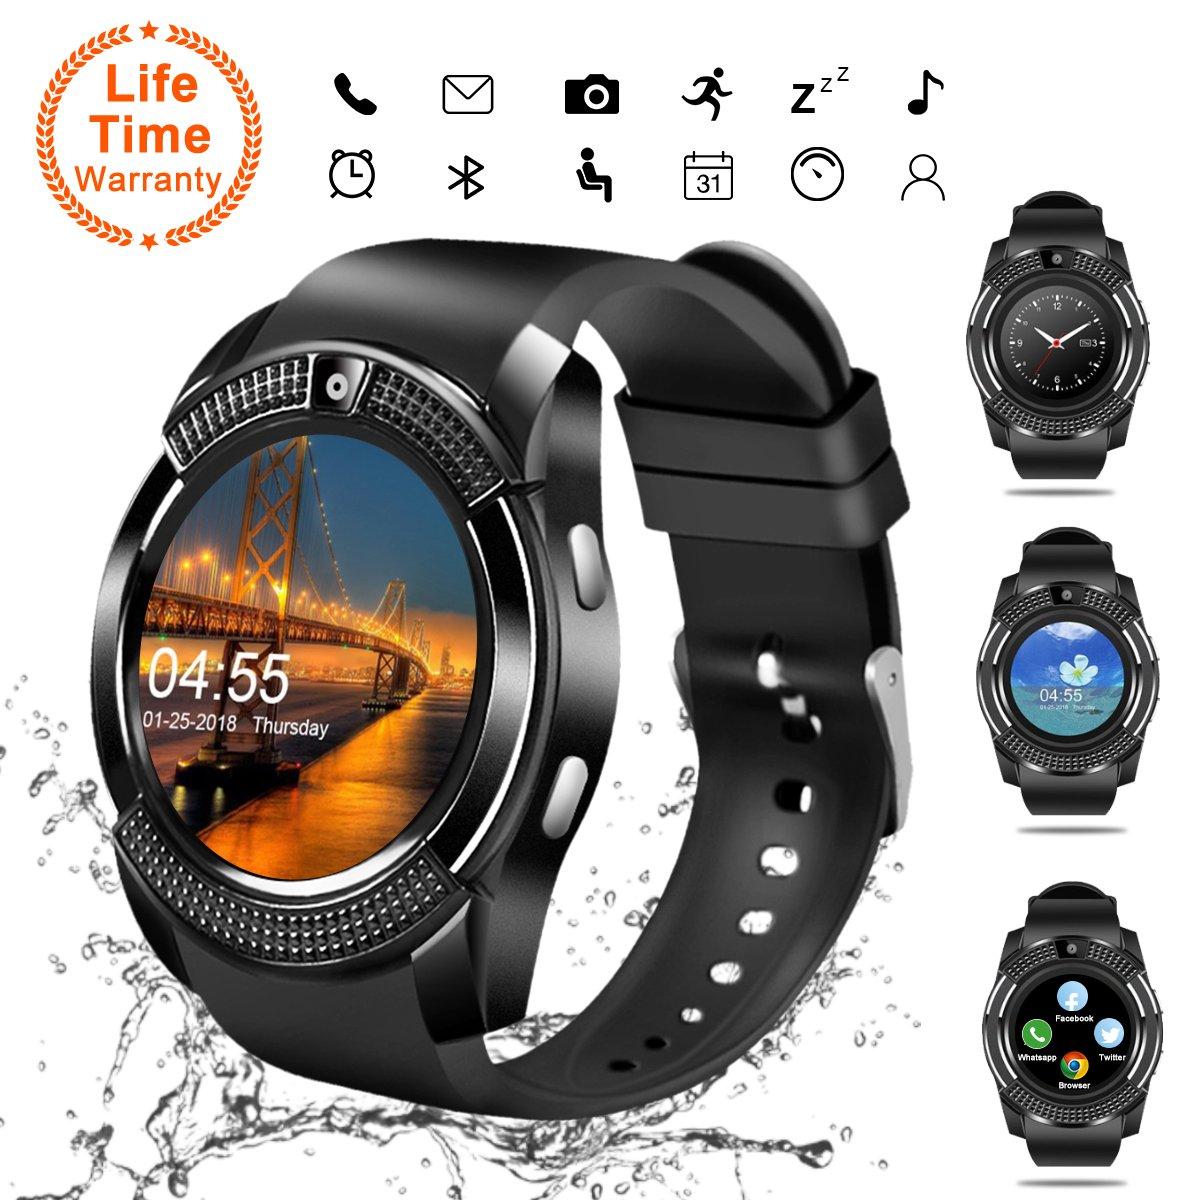 Android Smartwatch Bluetooth,Impermeable Reloj Inteligente con Cámara,Bluetooth Tactil Telefono Smart Watch Sport